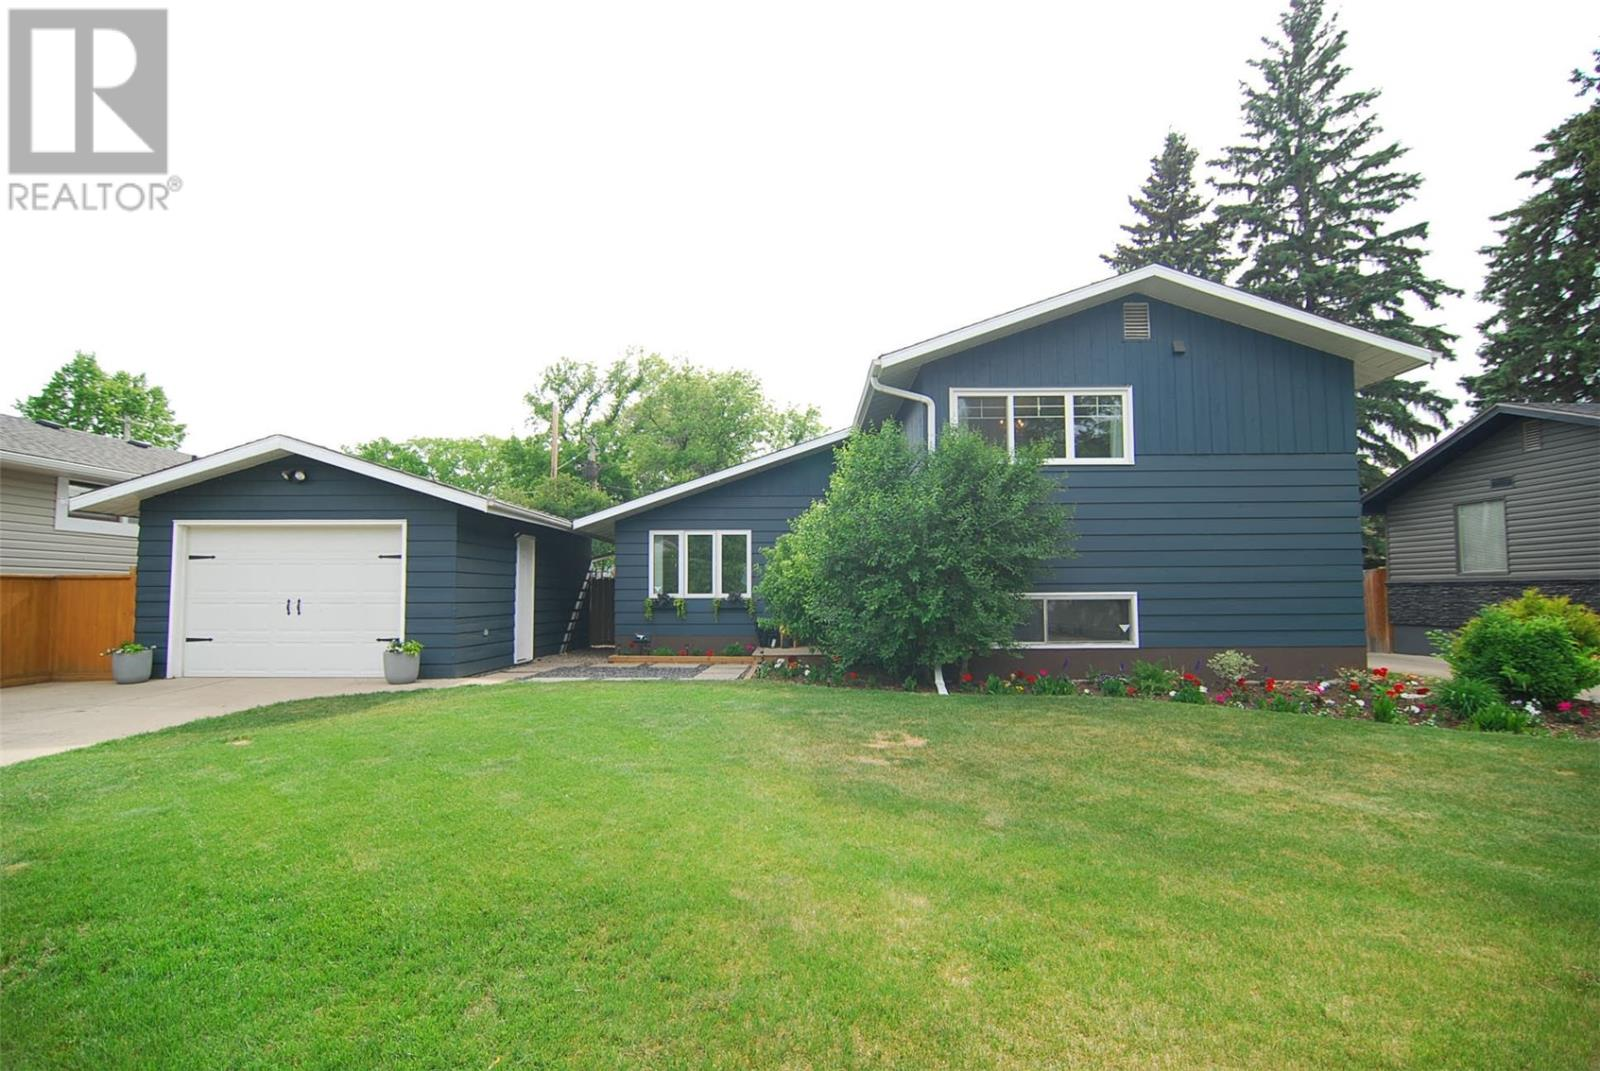 Removed: 2708 Maceachern Avenue, Saskatoon, SK - Removed on 2019-06-25 06:03:21